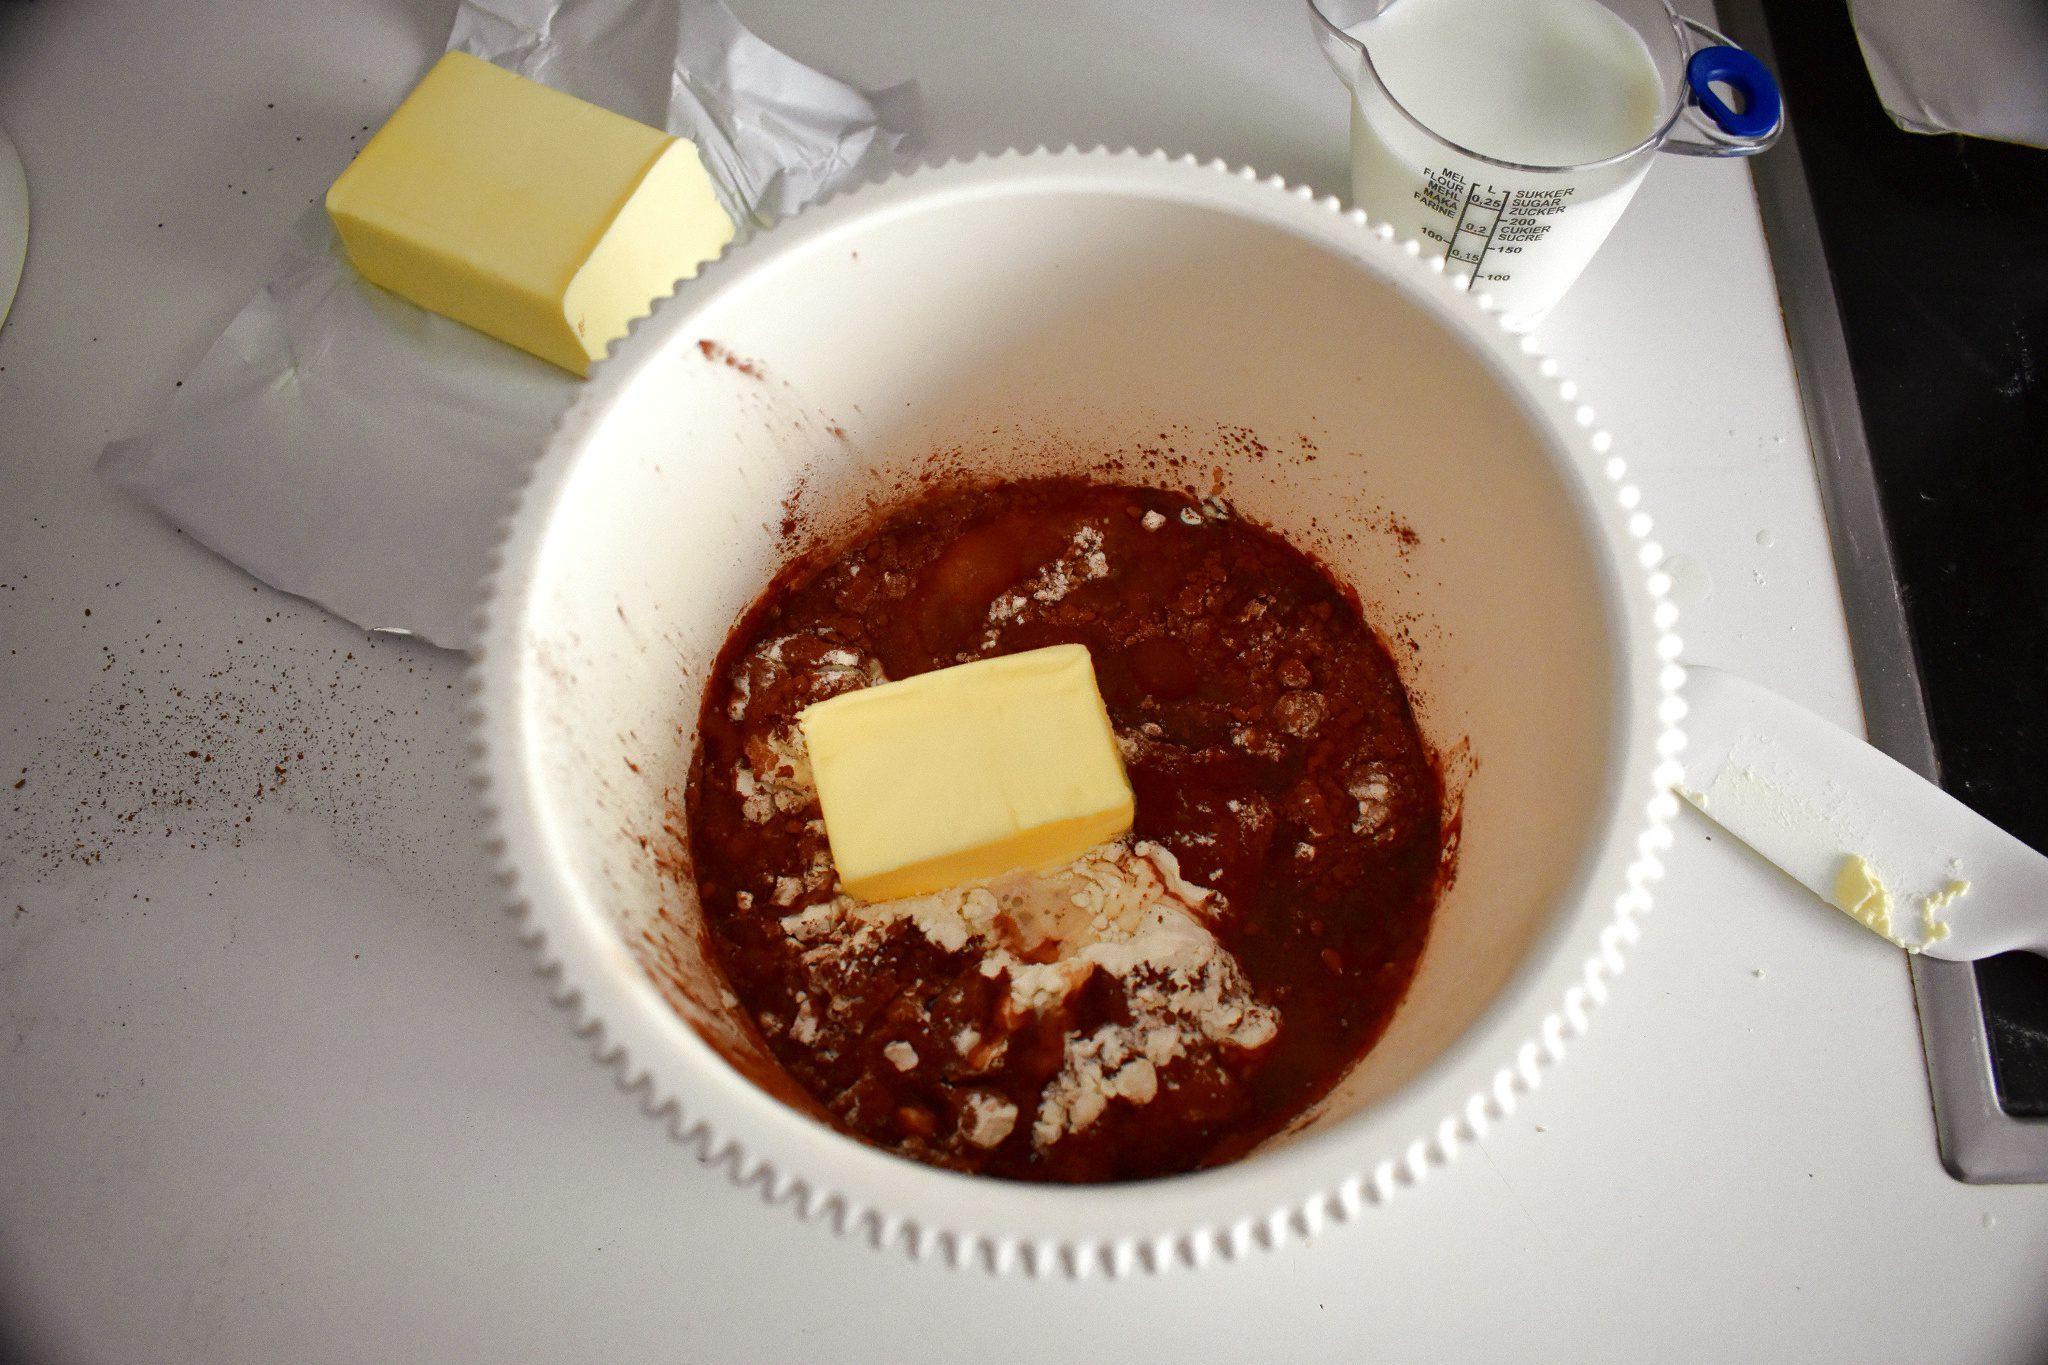 Chocolate-crepes-process-4-SunCakeMom